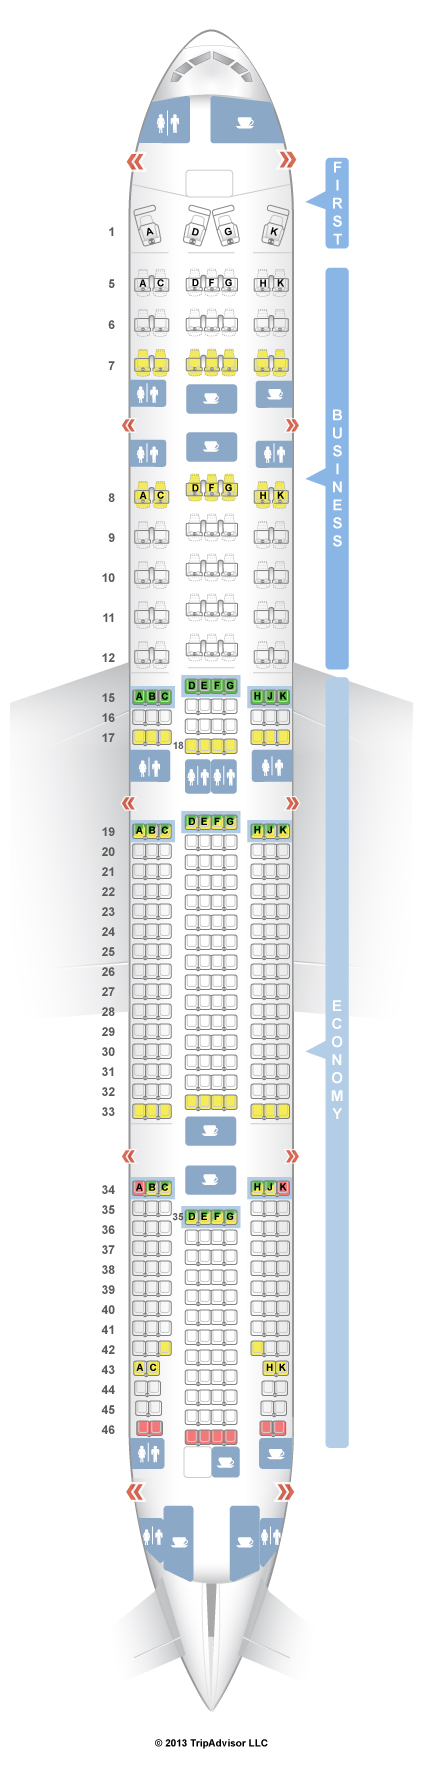 Seatguru Seat Map Tam Boeing 777 300 777 V1 Brasil Mapa Mapa